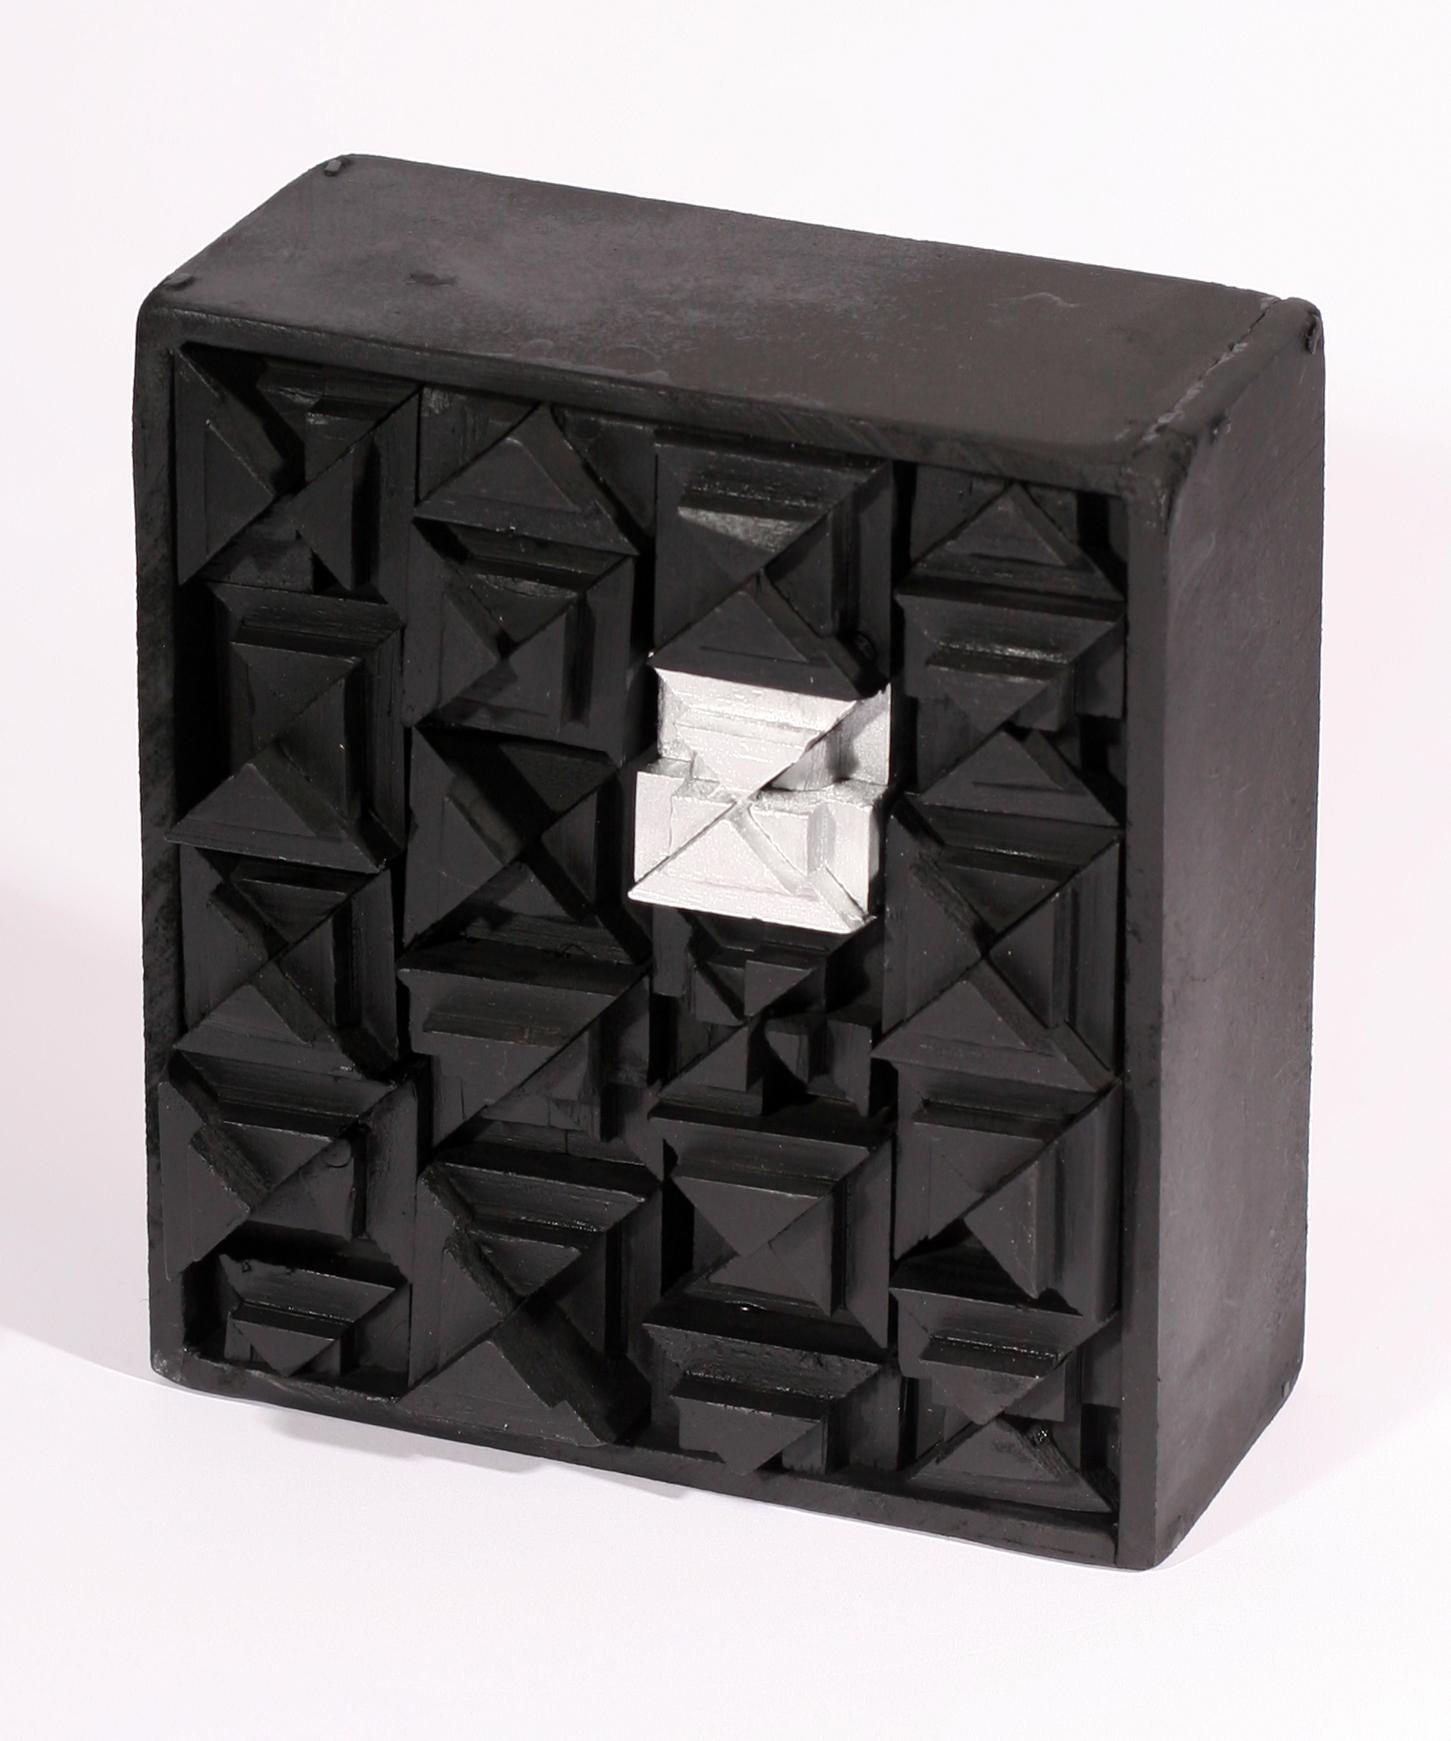 1-thebox1.jpg